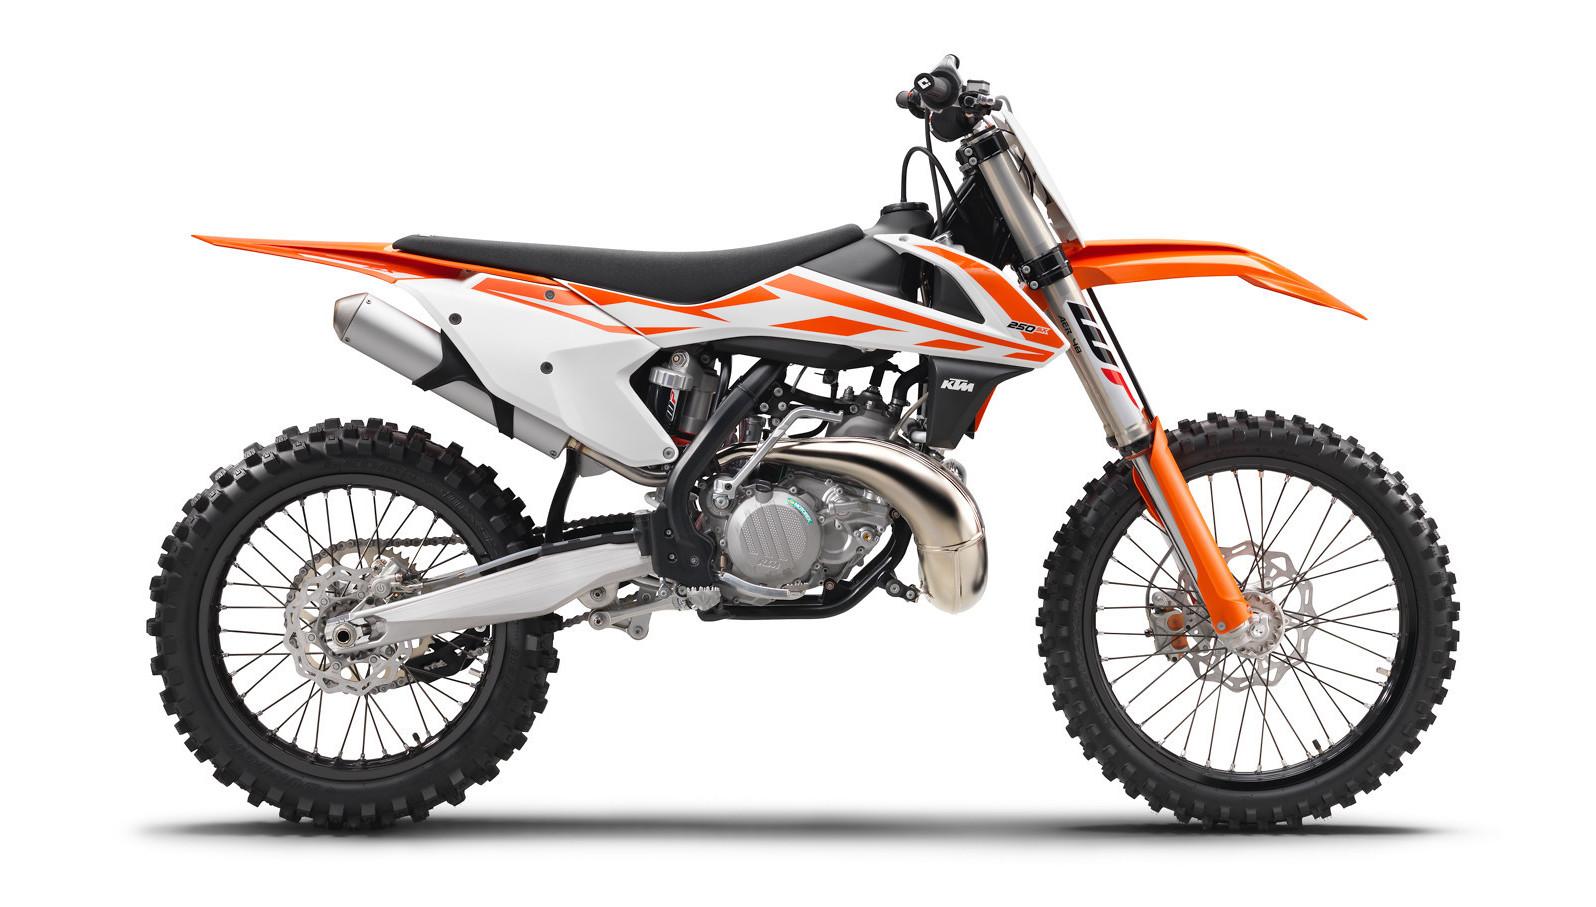 2017 ktm 250 sx reviews comparisons specs motocross dirt bike bikes vital mx. Black Bedroom Furniture Sets. Home Design Ideas